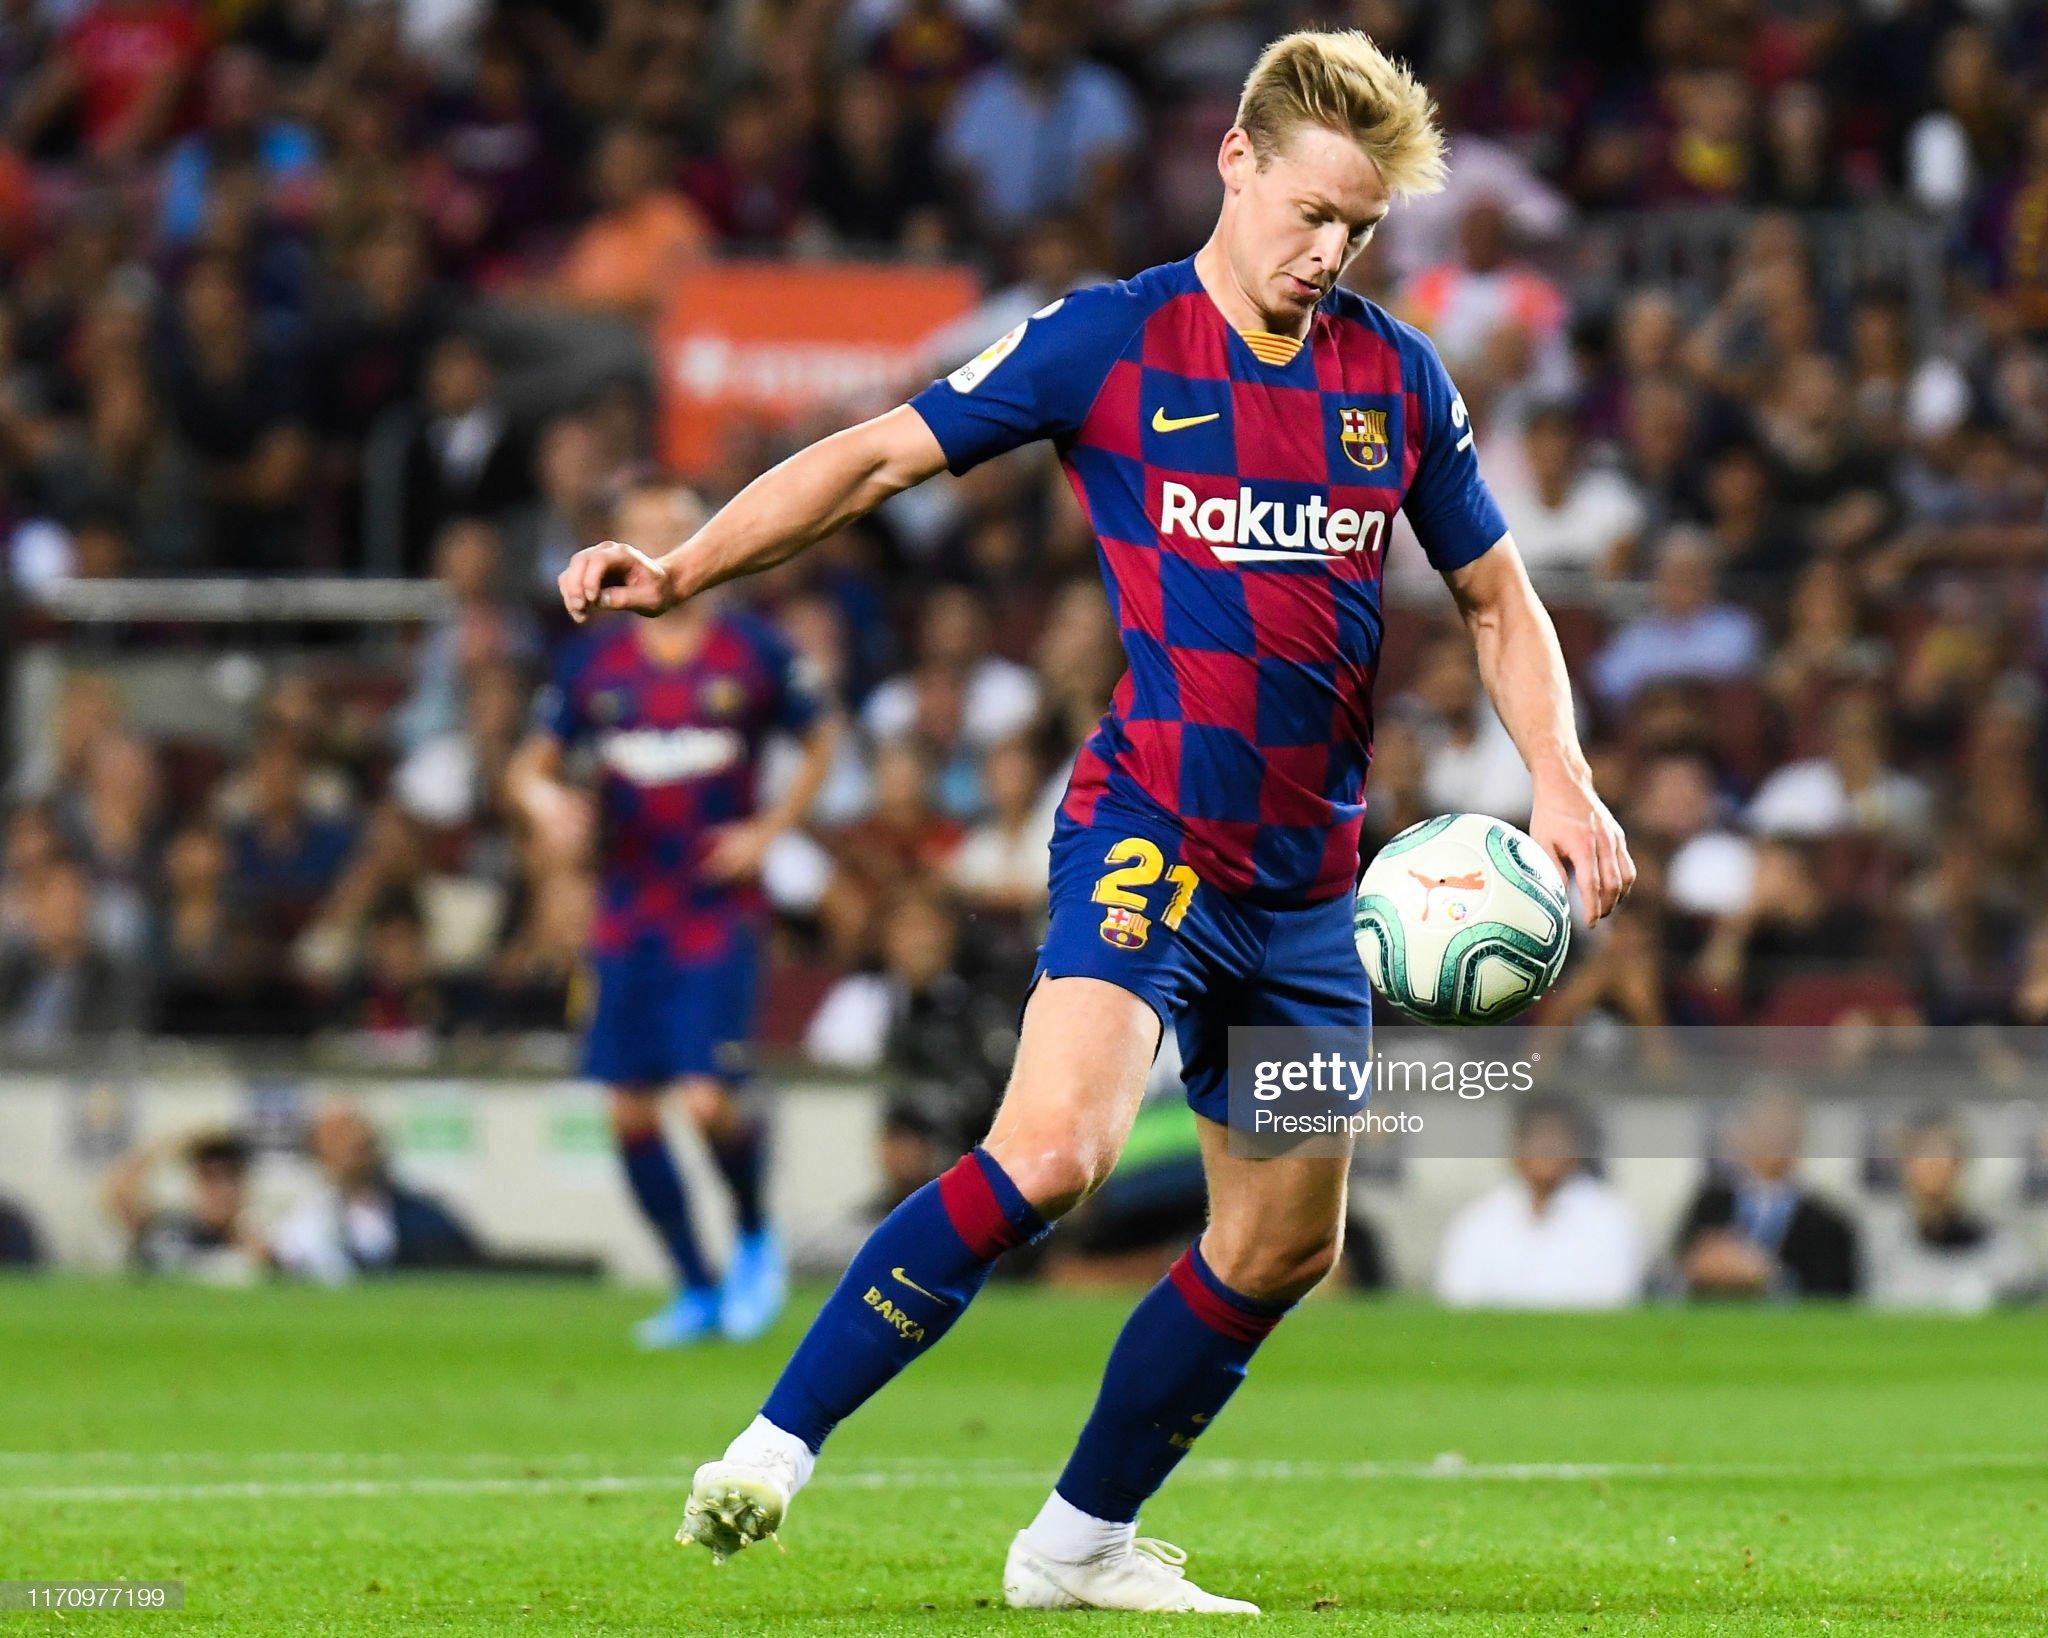 صور مباراة : برشلونة - فياريال 2-1 ( 24-09-2019 )  Frenkie-de-jong-of-fc-barcelona-during-the-liga-match-between-and-picture-id1170977199?s=2048x2048